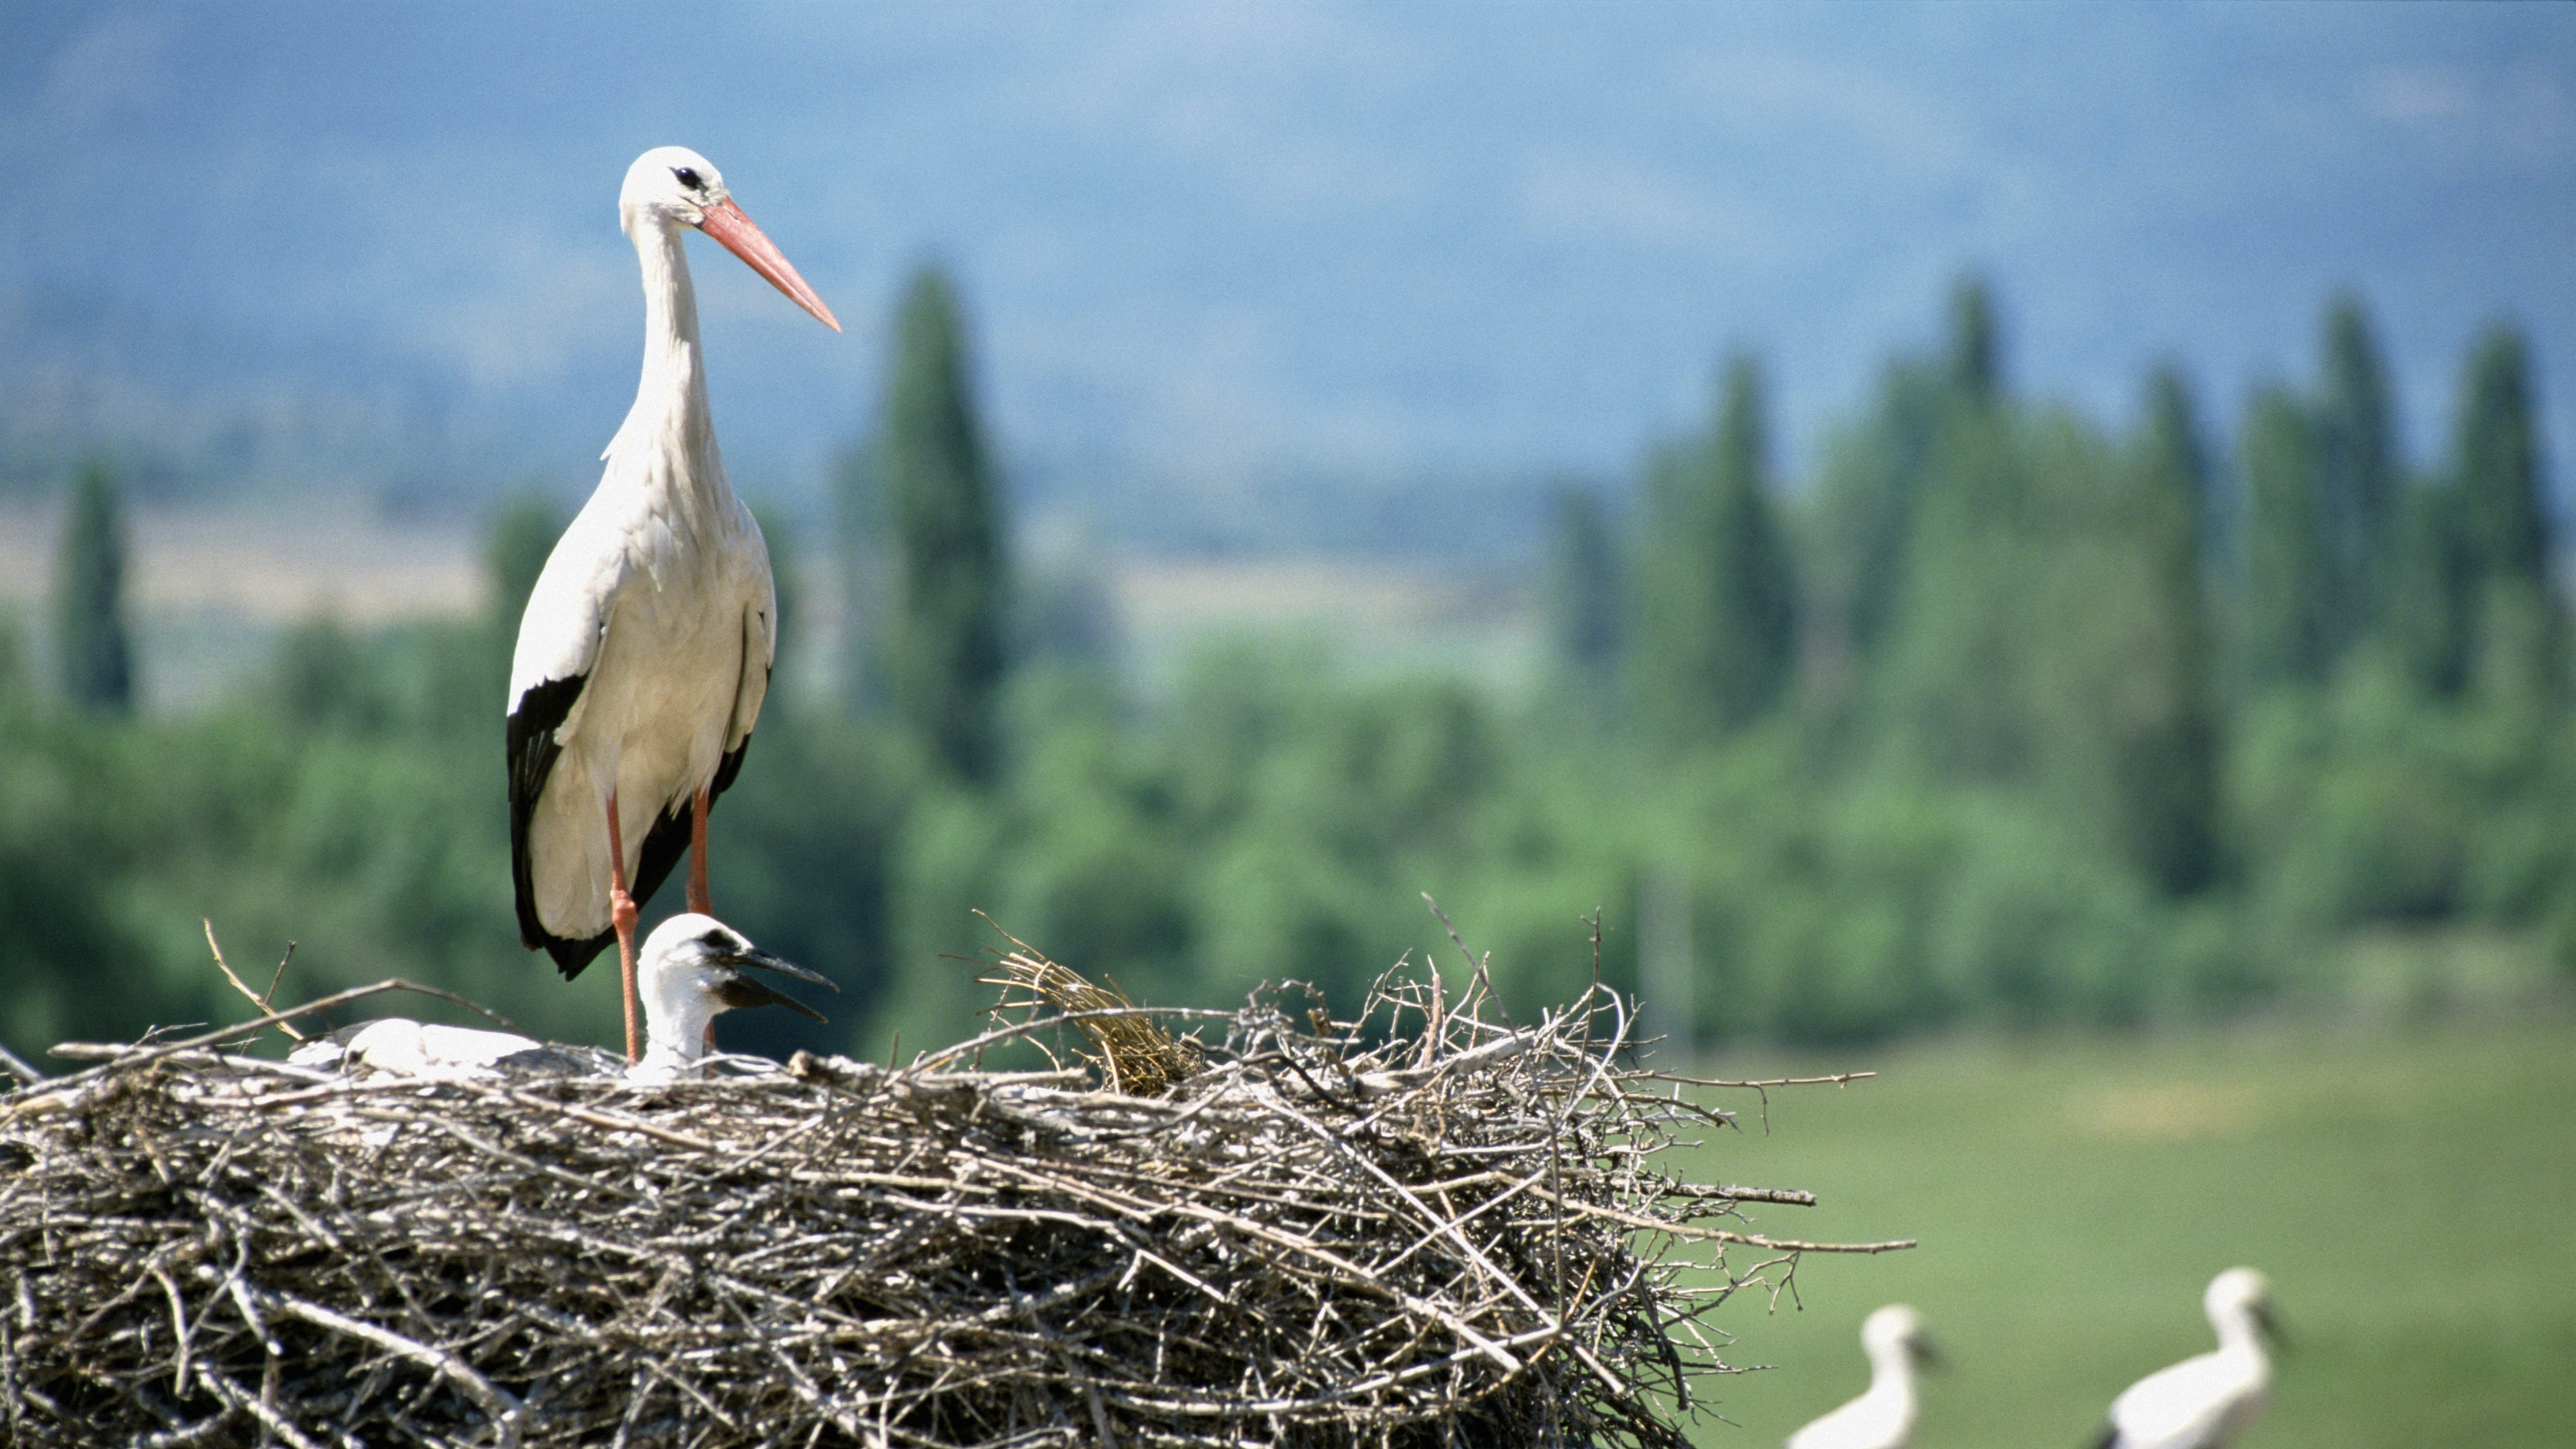 cranes chick nest 4k 1542241598 - cranes, chick, nest 4k - Nest, Cranes, chick